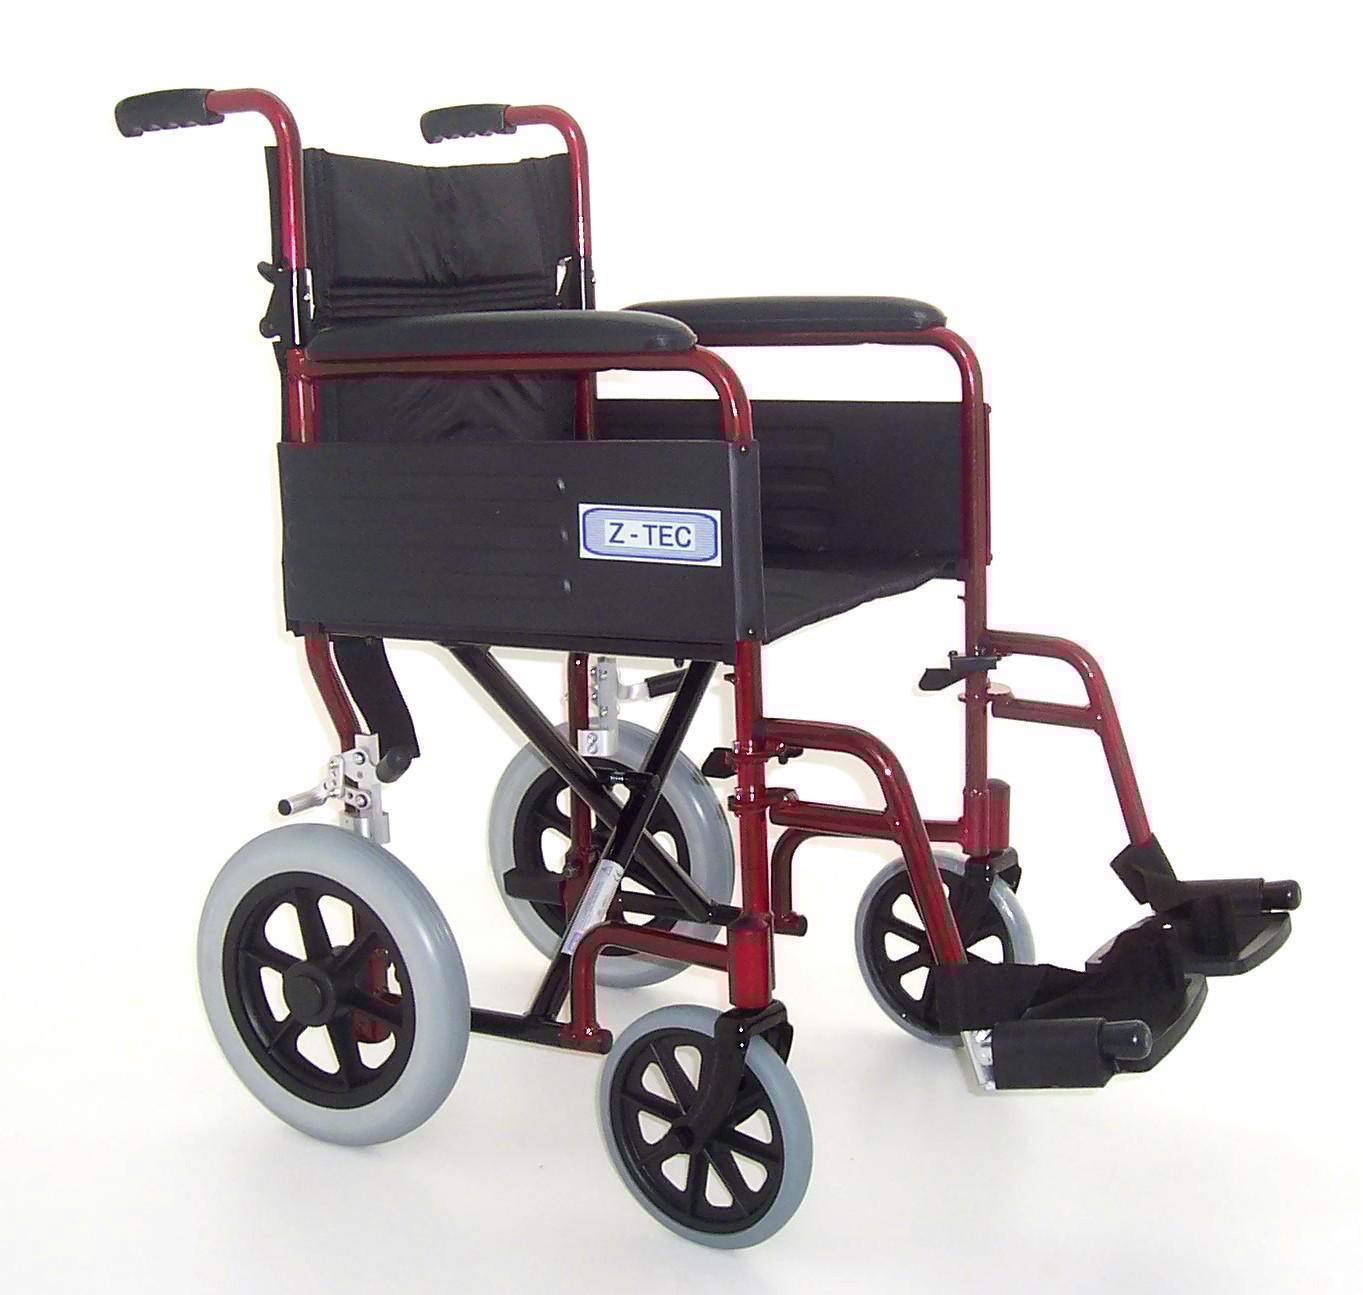 Lightweight Folding Transit Wheelchair Z-Tech Red